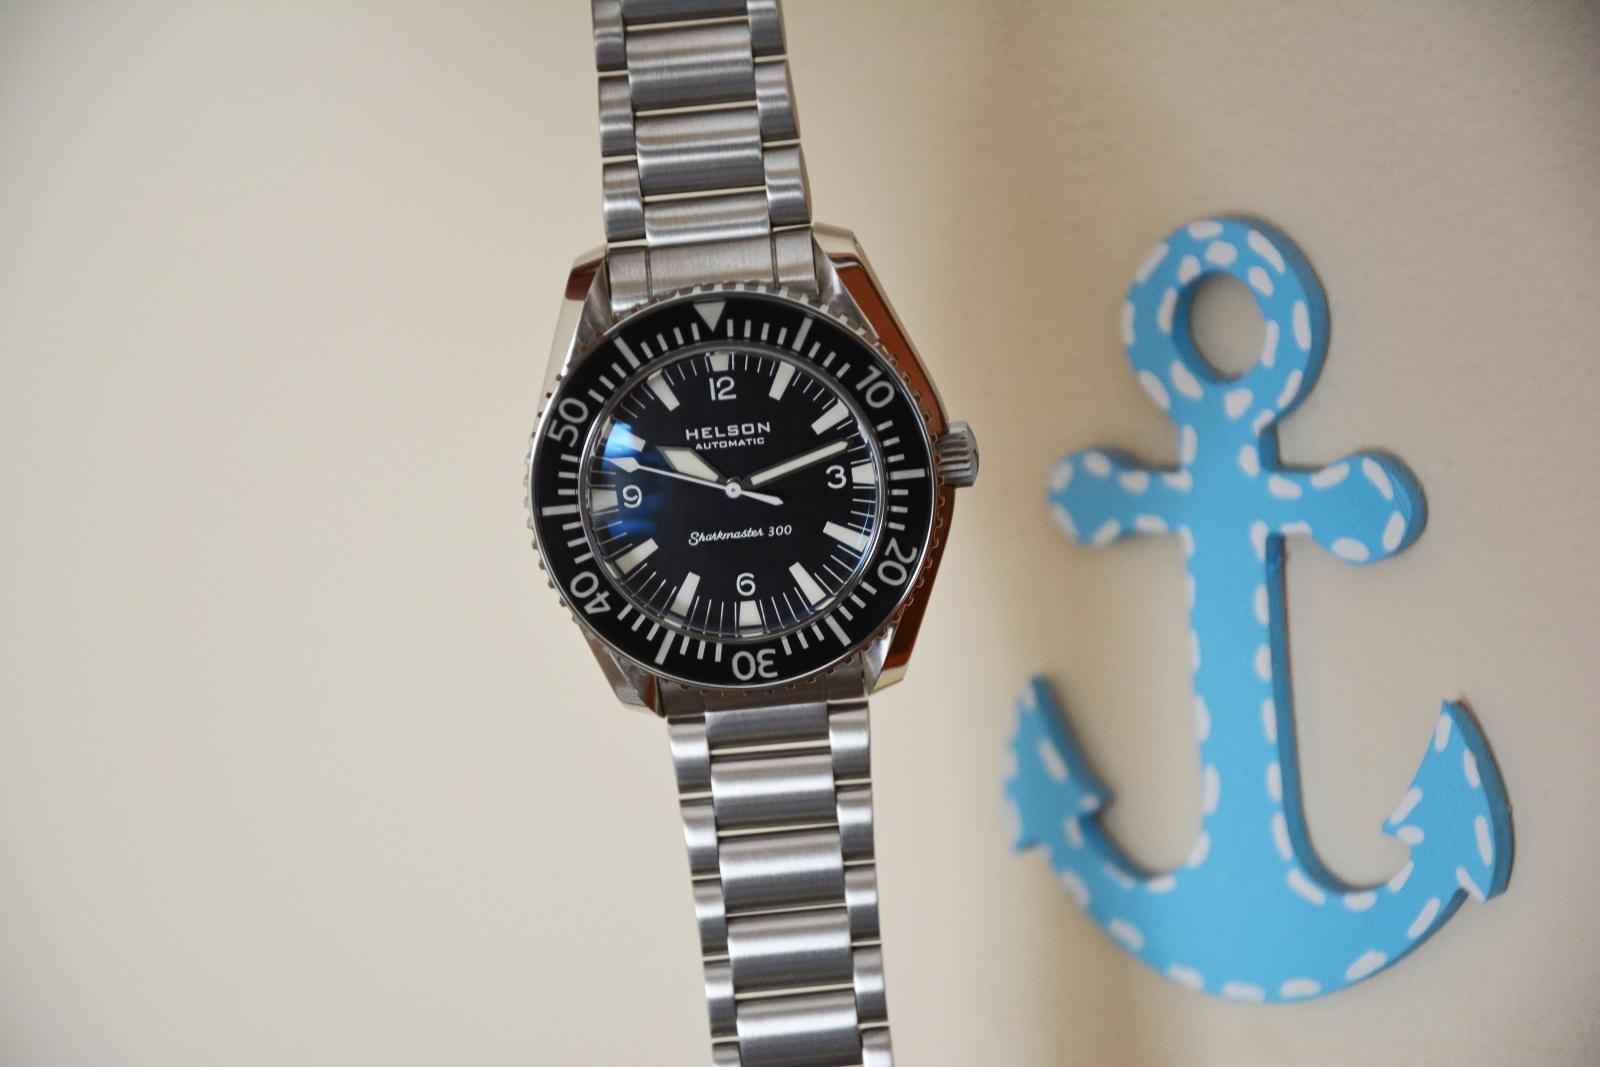 Helson Sharkmaster 300